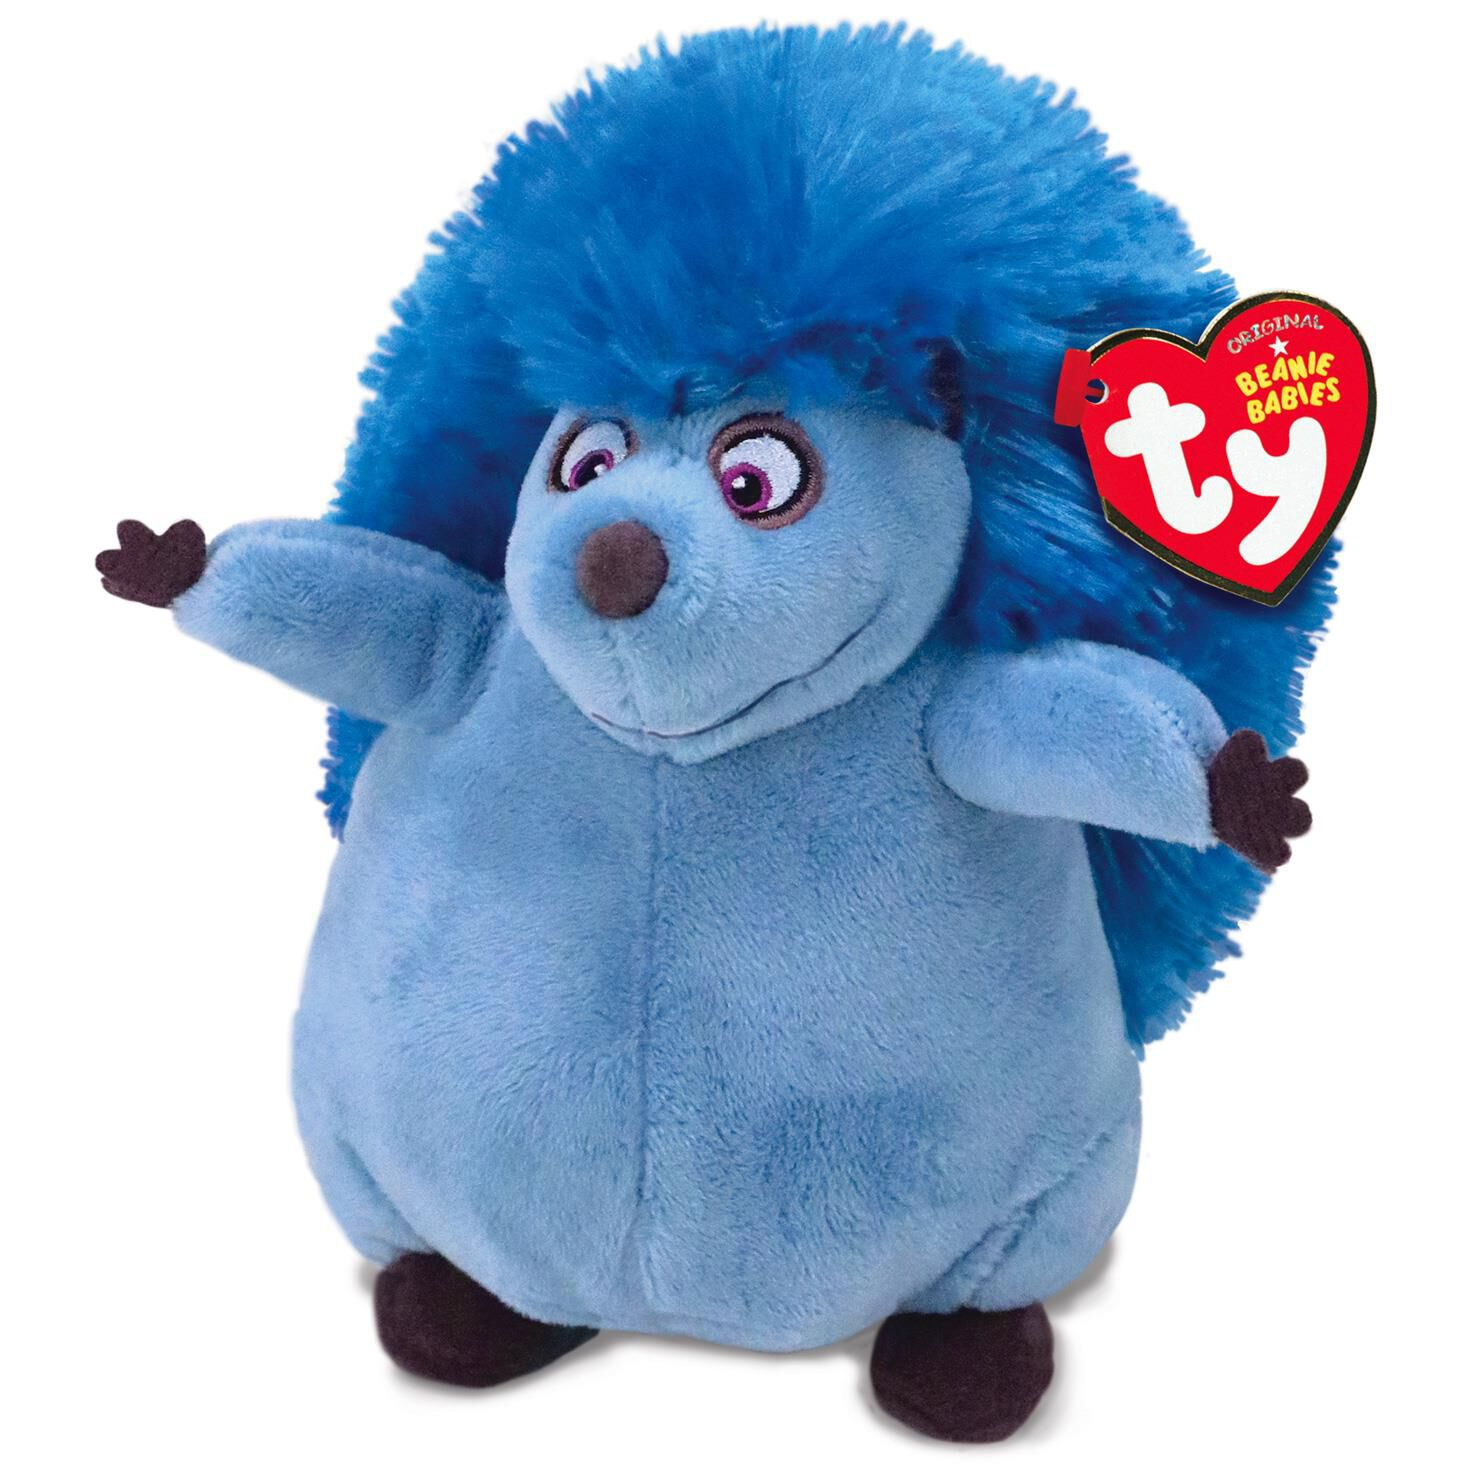 Ty® Beanie Babies Cuatro the Hedgehog Stuffed Animal 3df523a43c1